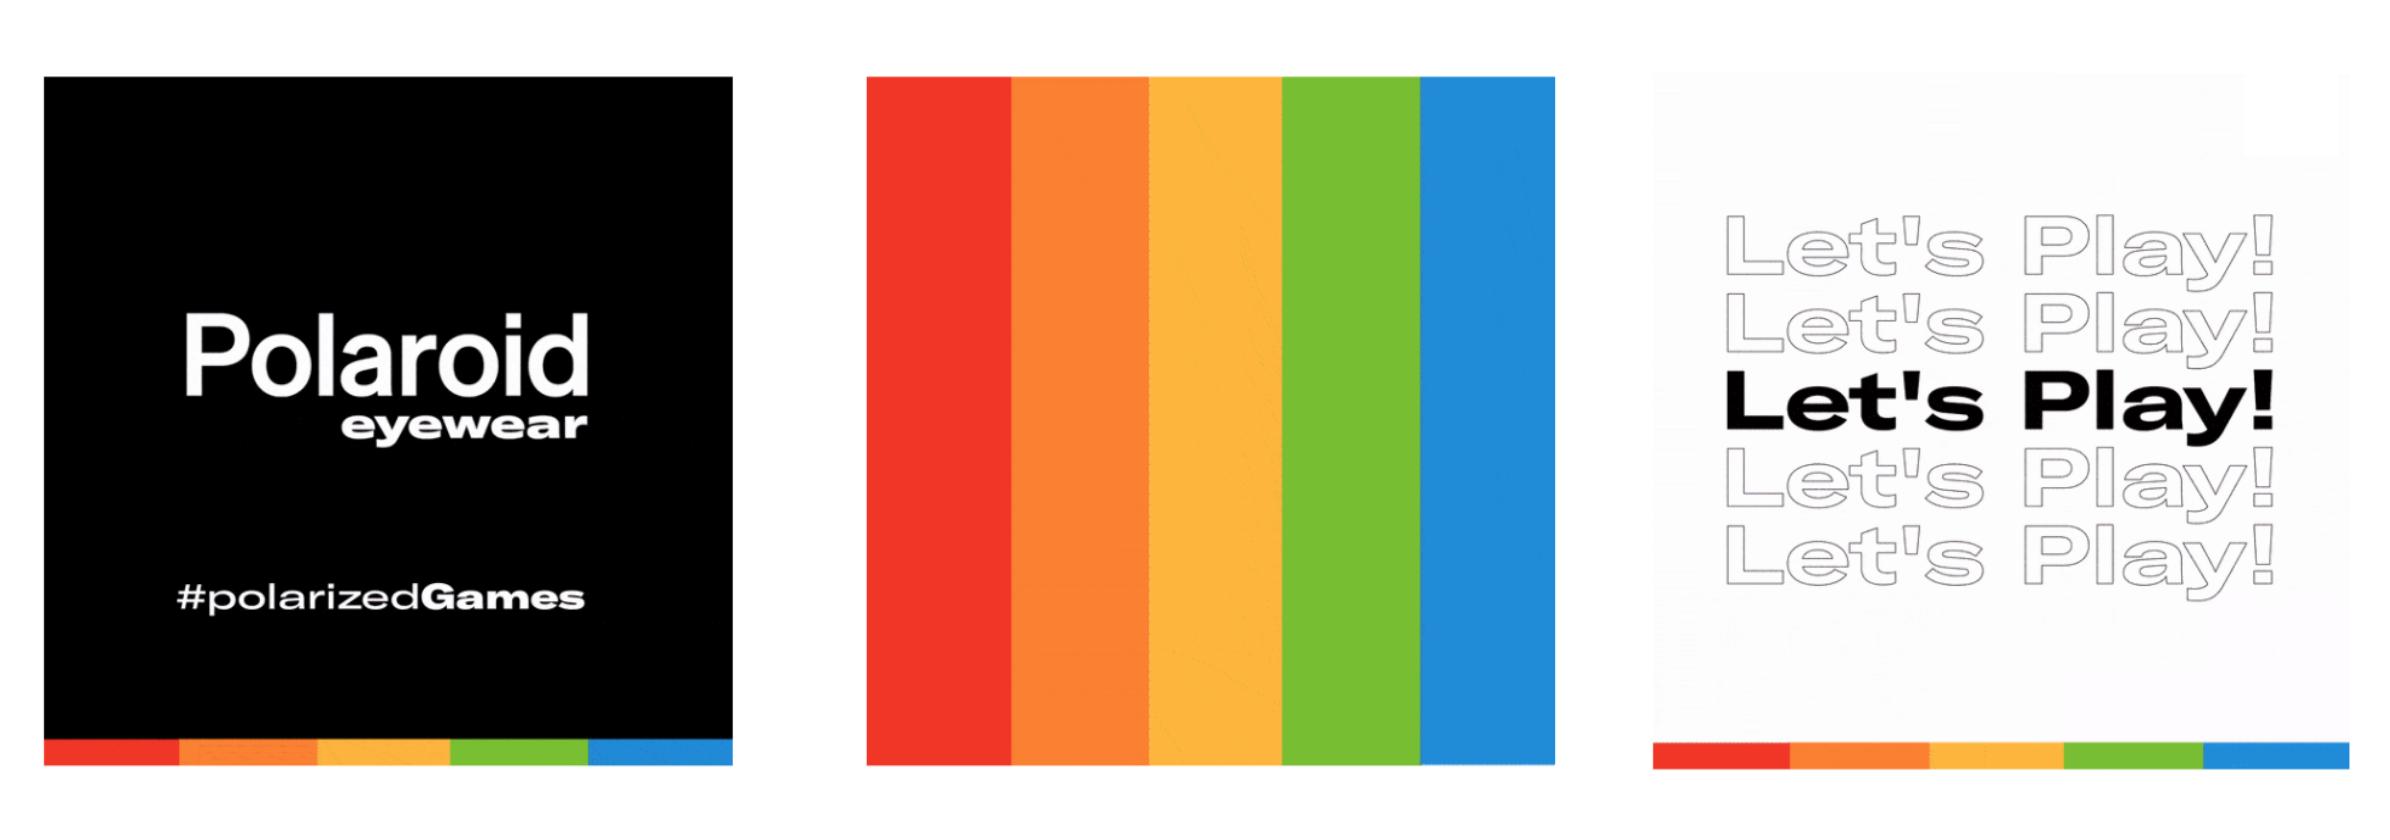 Advergames_Brand Identity